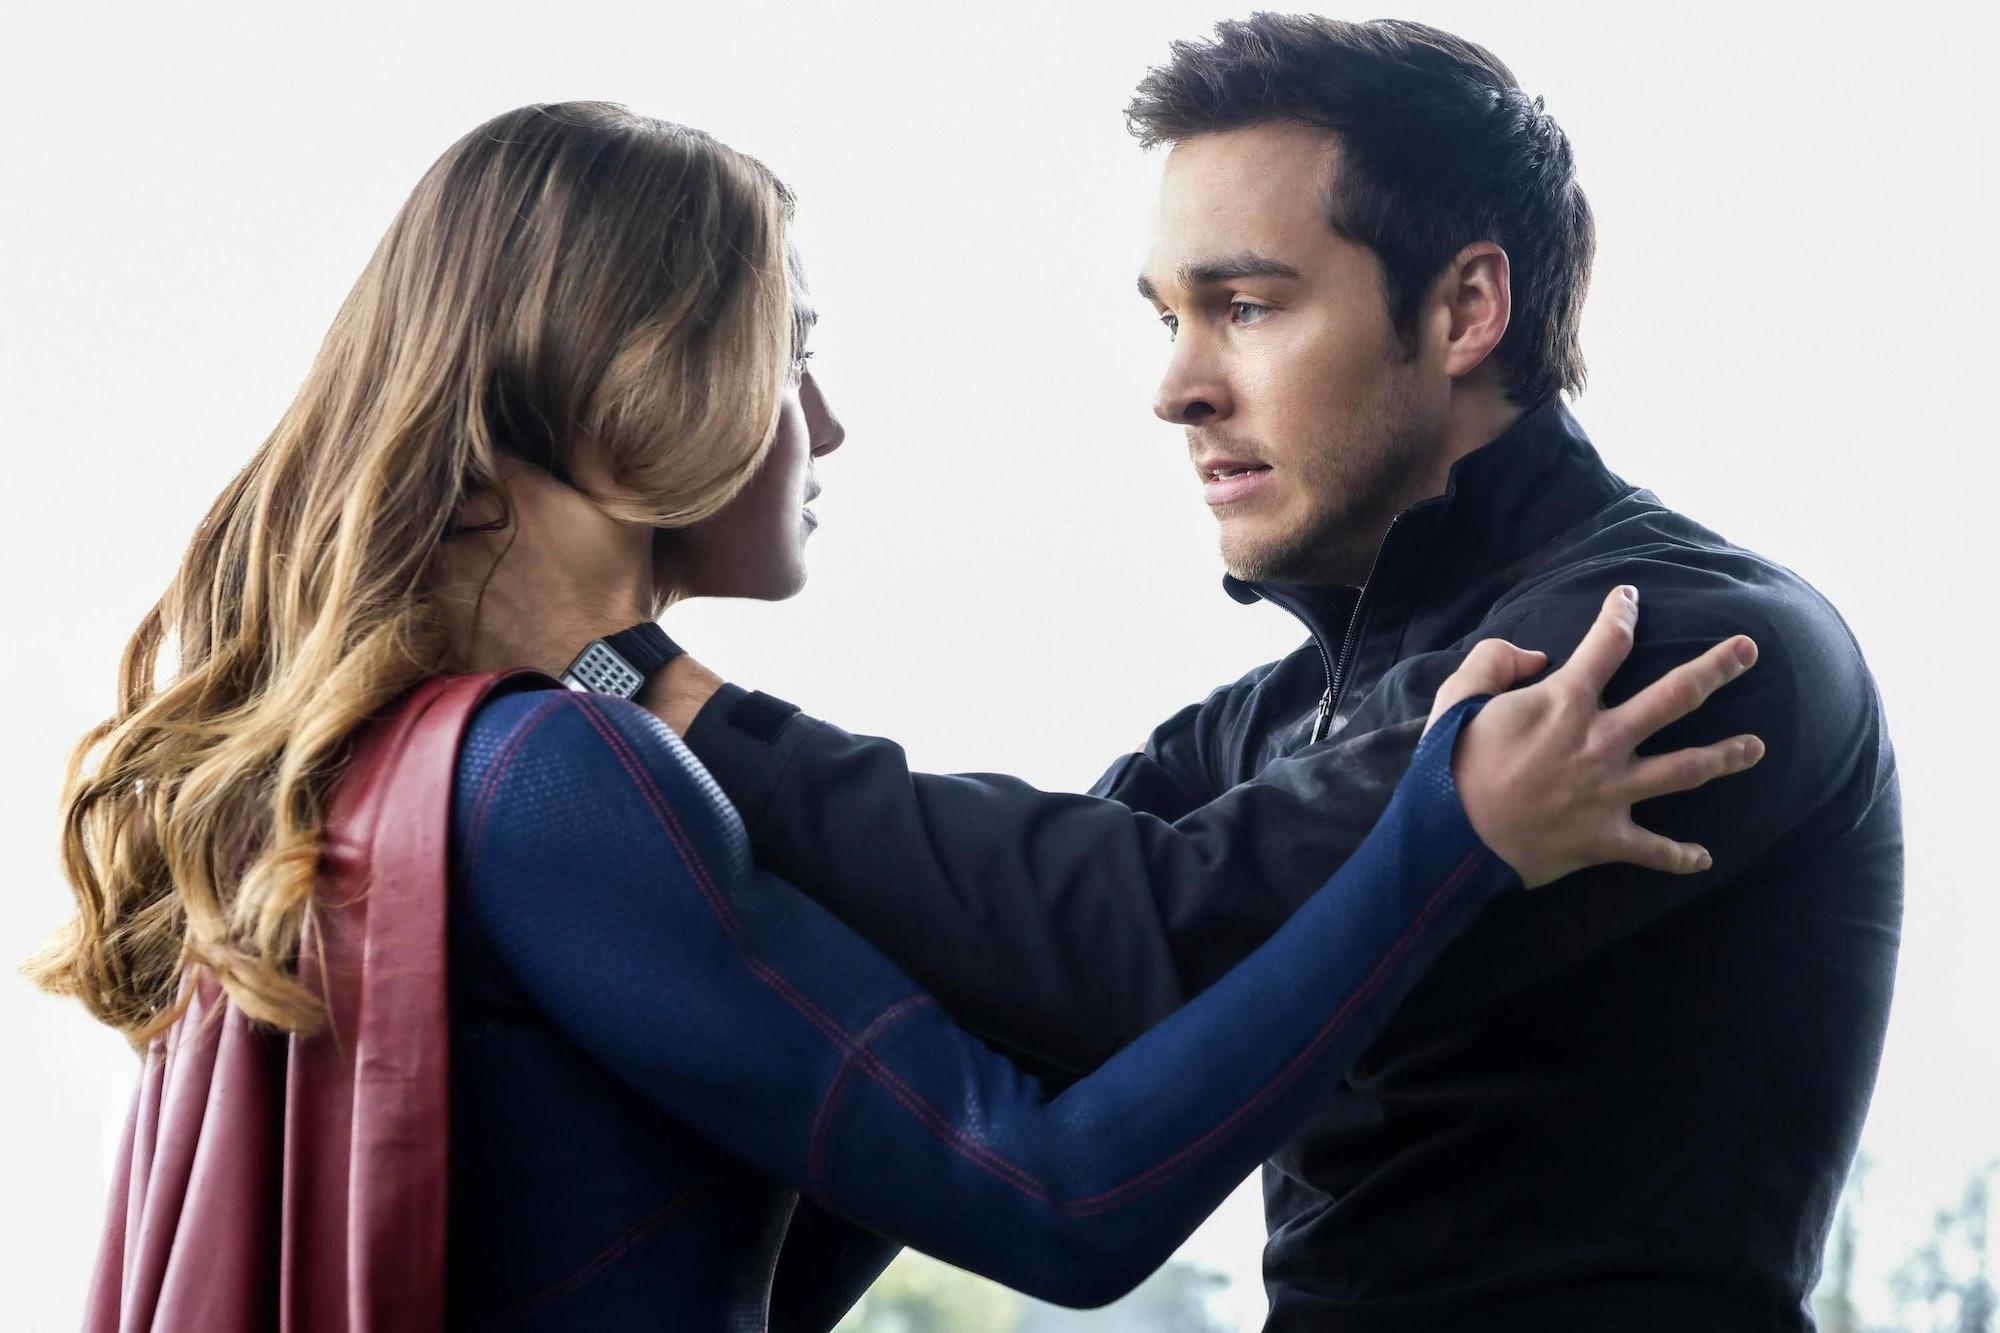 Supergirl and Mon-El